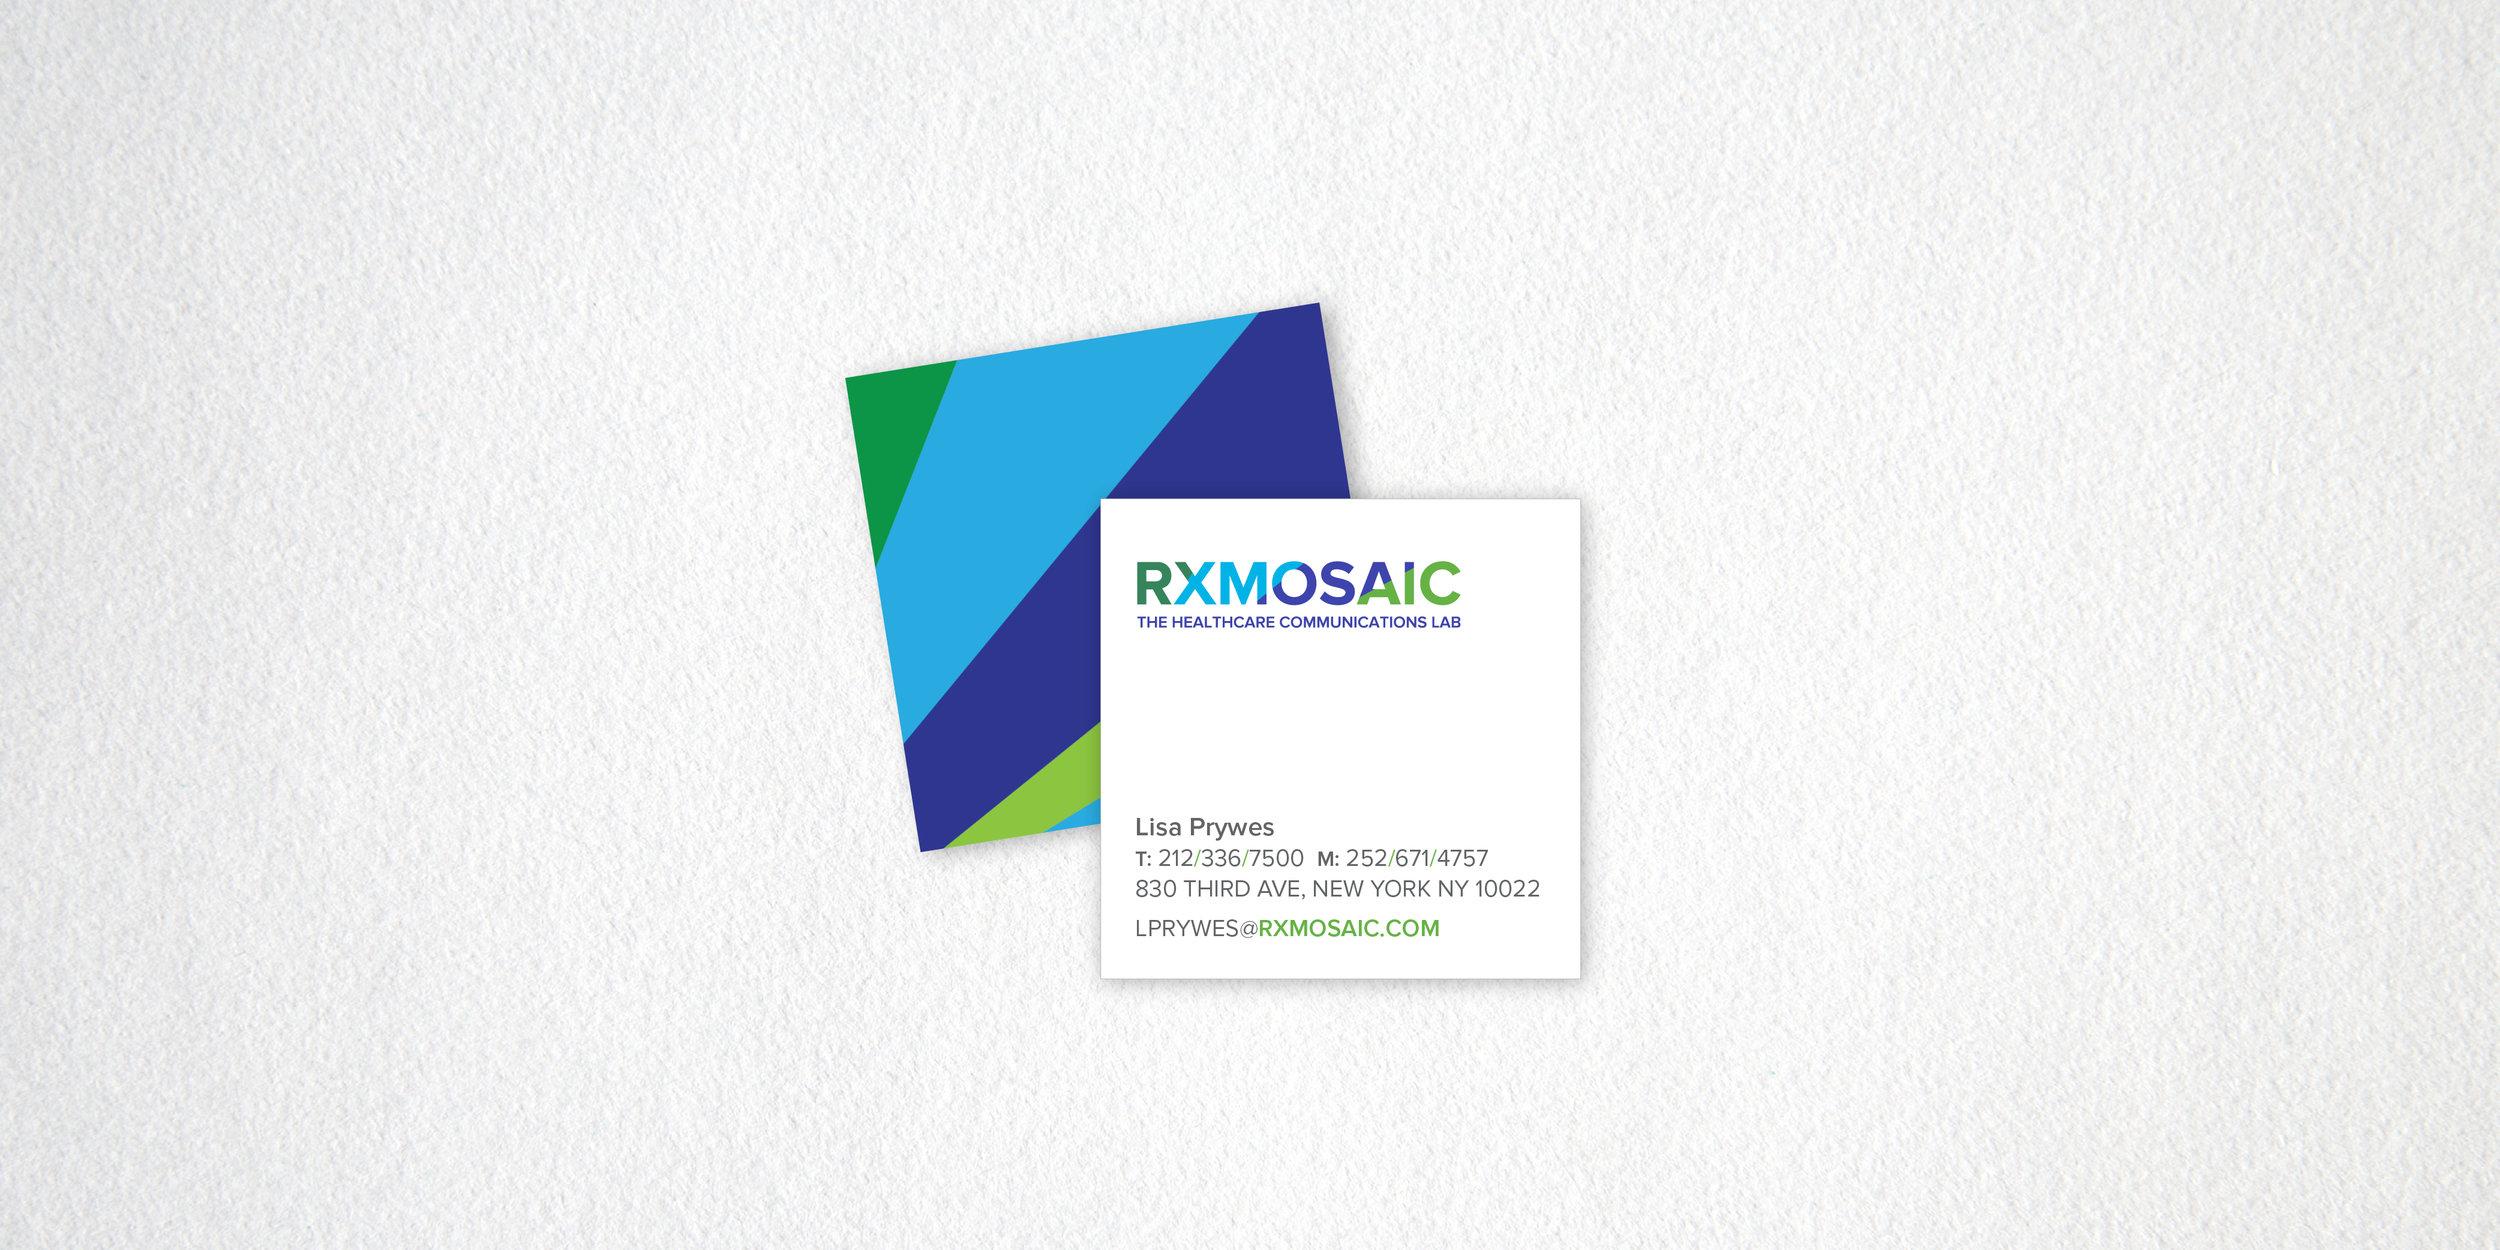 RXMOSAIC-new2.jpg